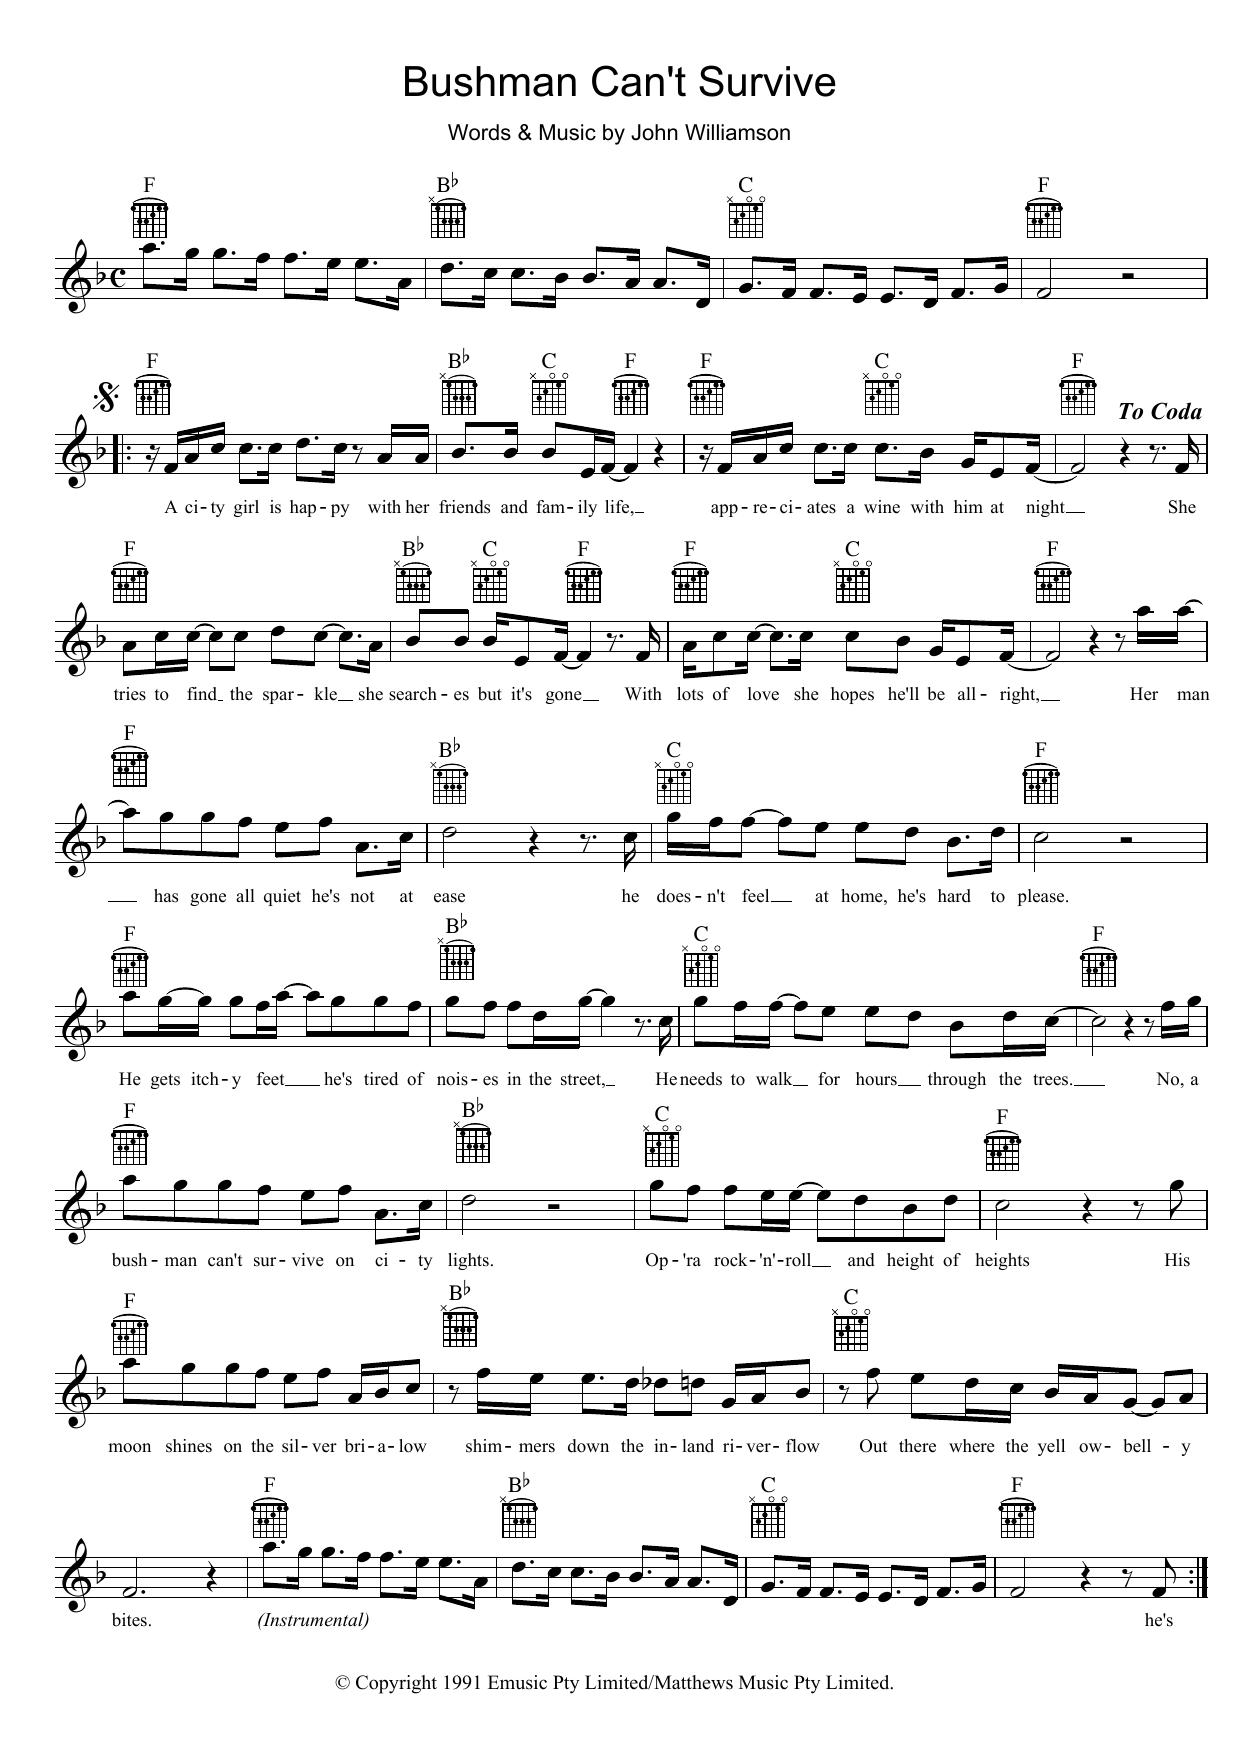 Sheet Music Digital Files To Print Licensed John Williamson